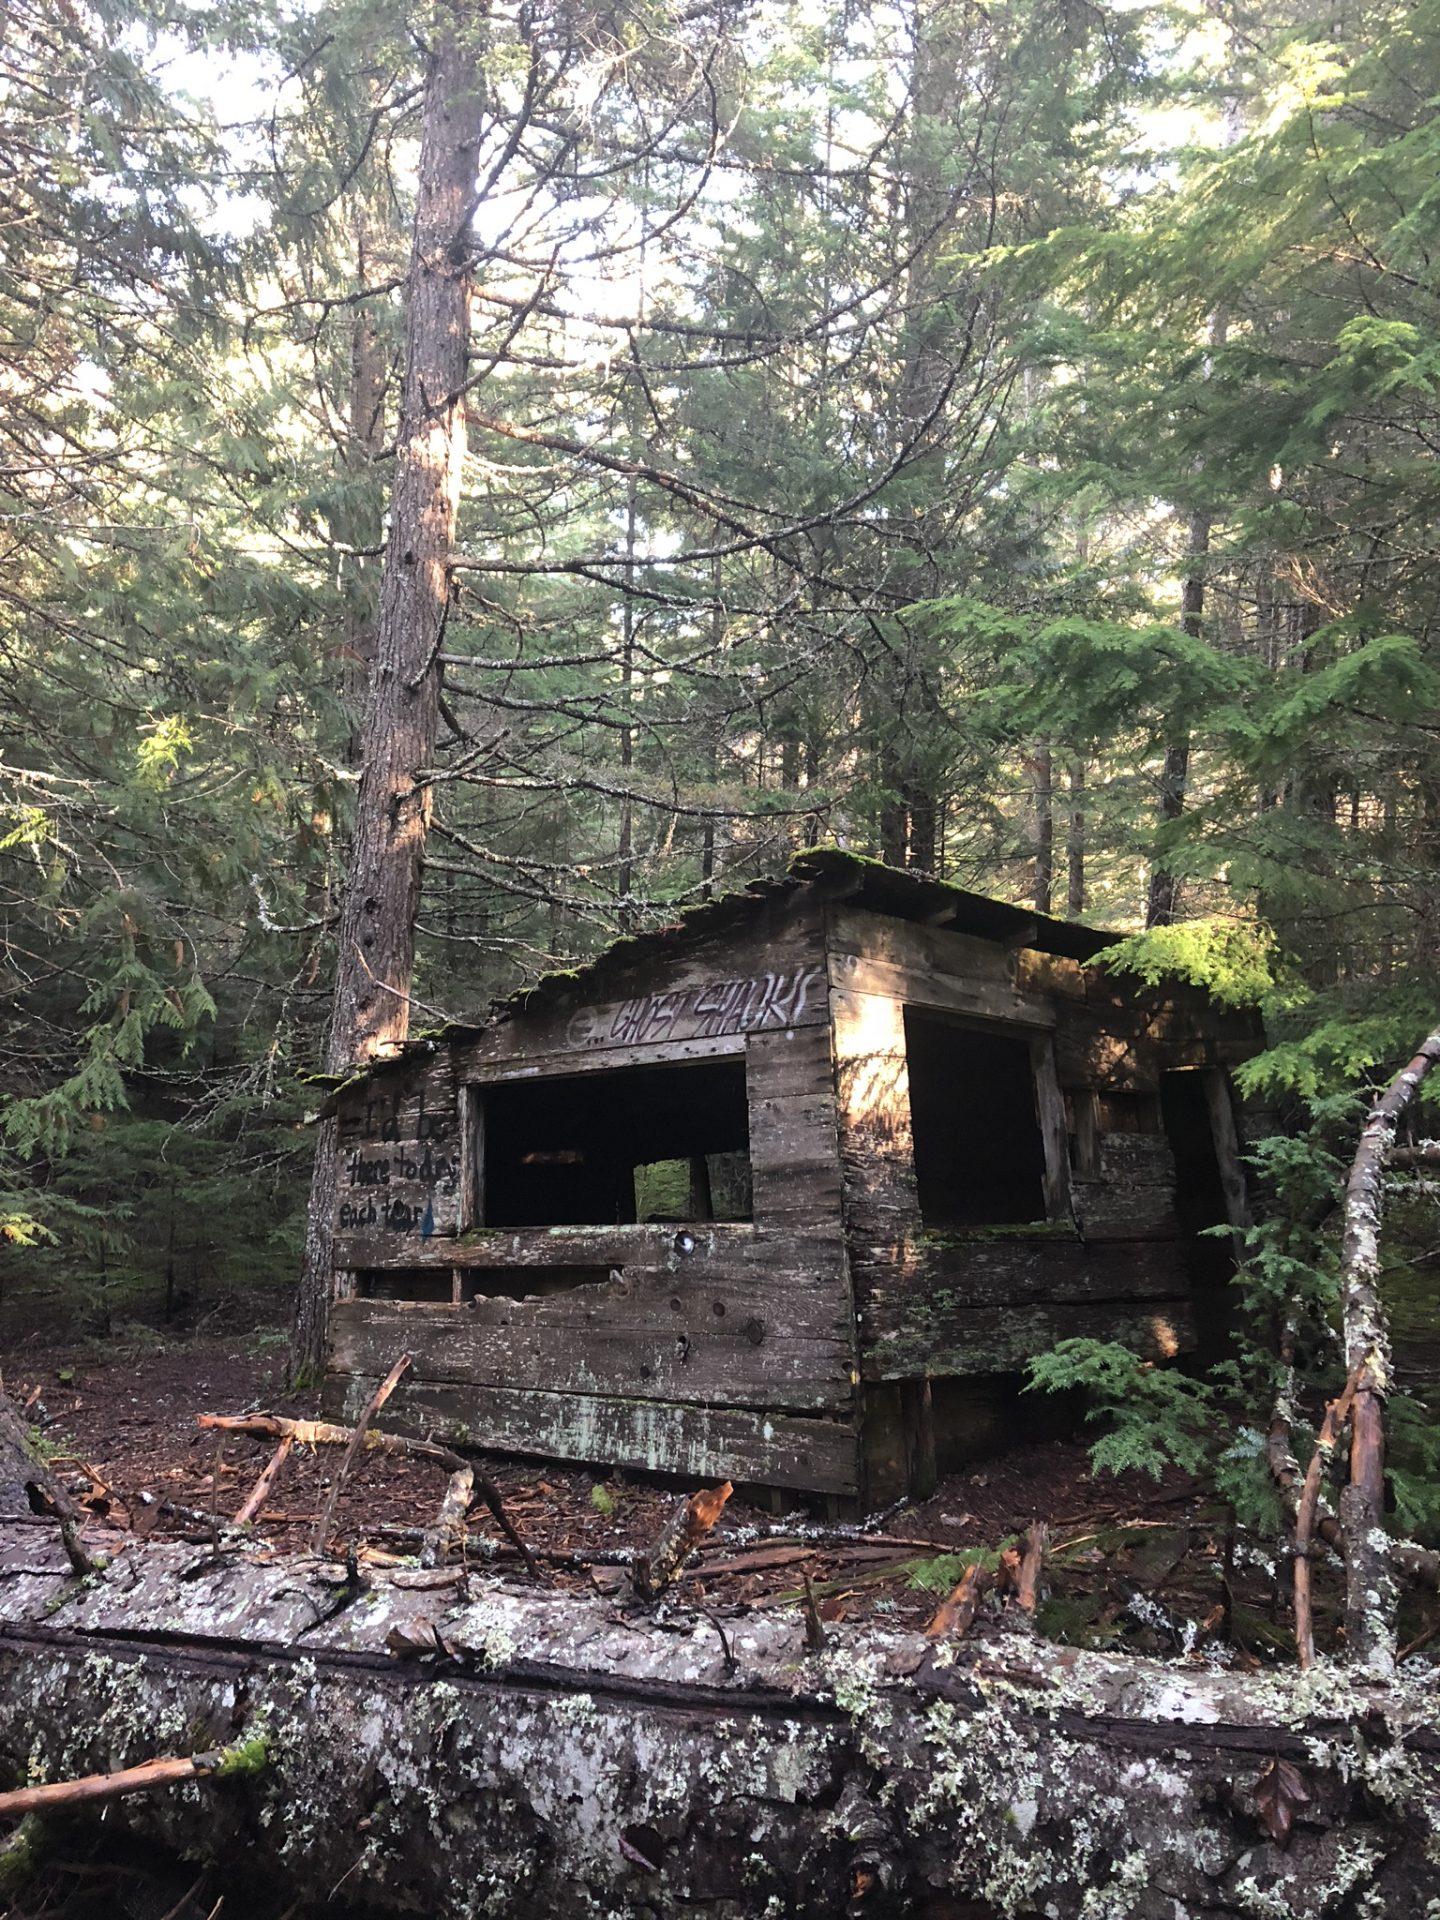 Abandoned house in the forest in Parkhurst near Whistler